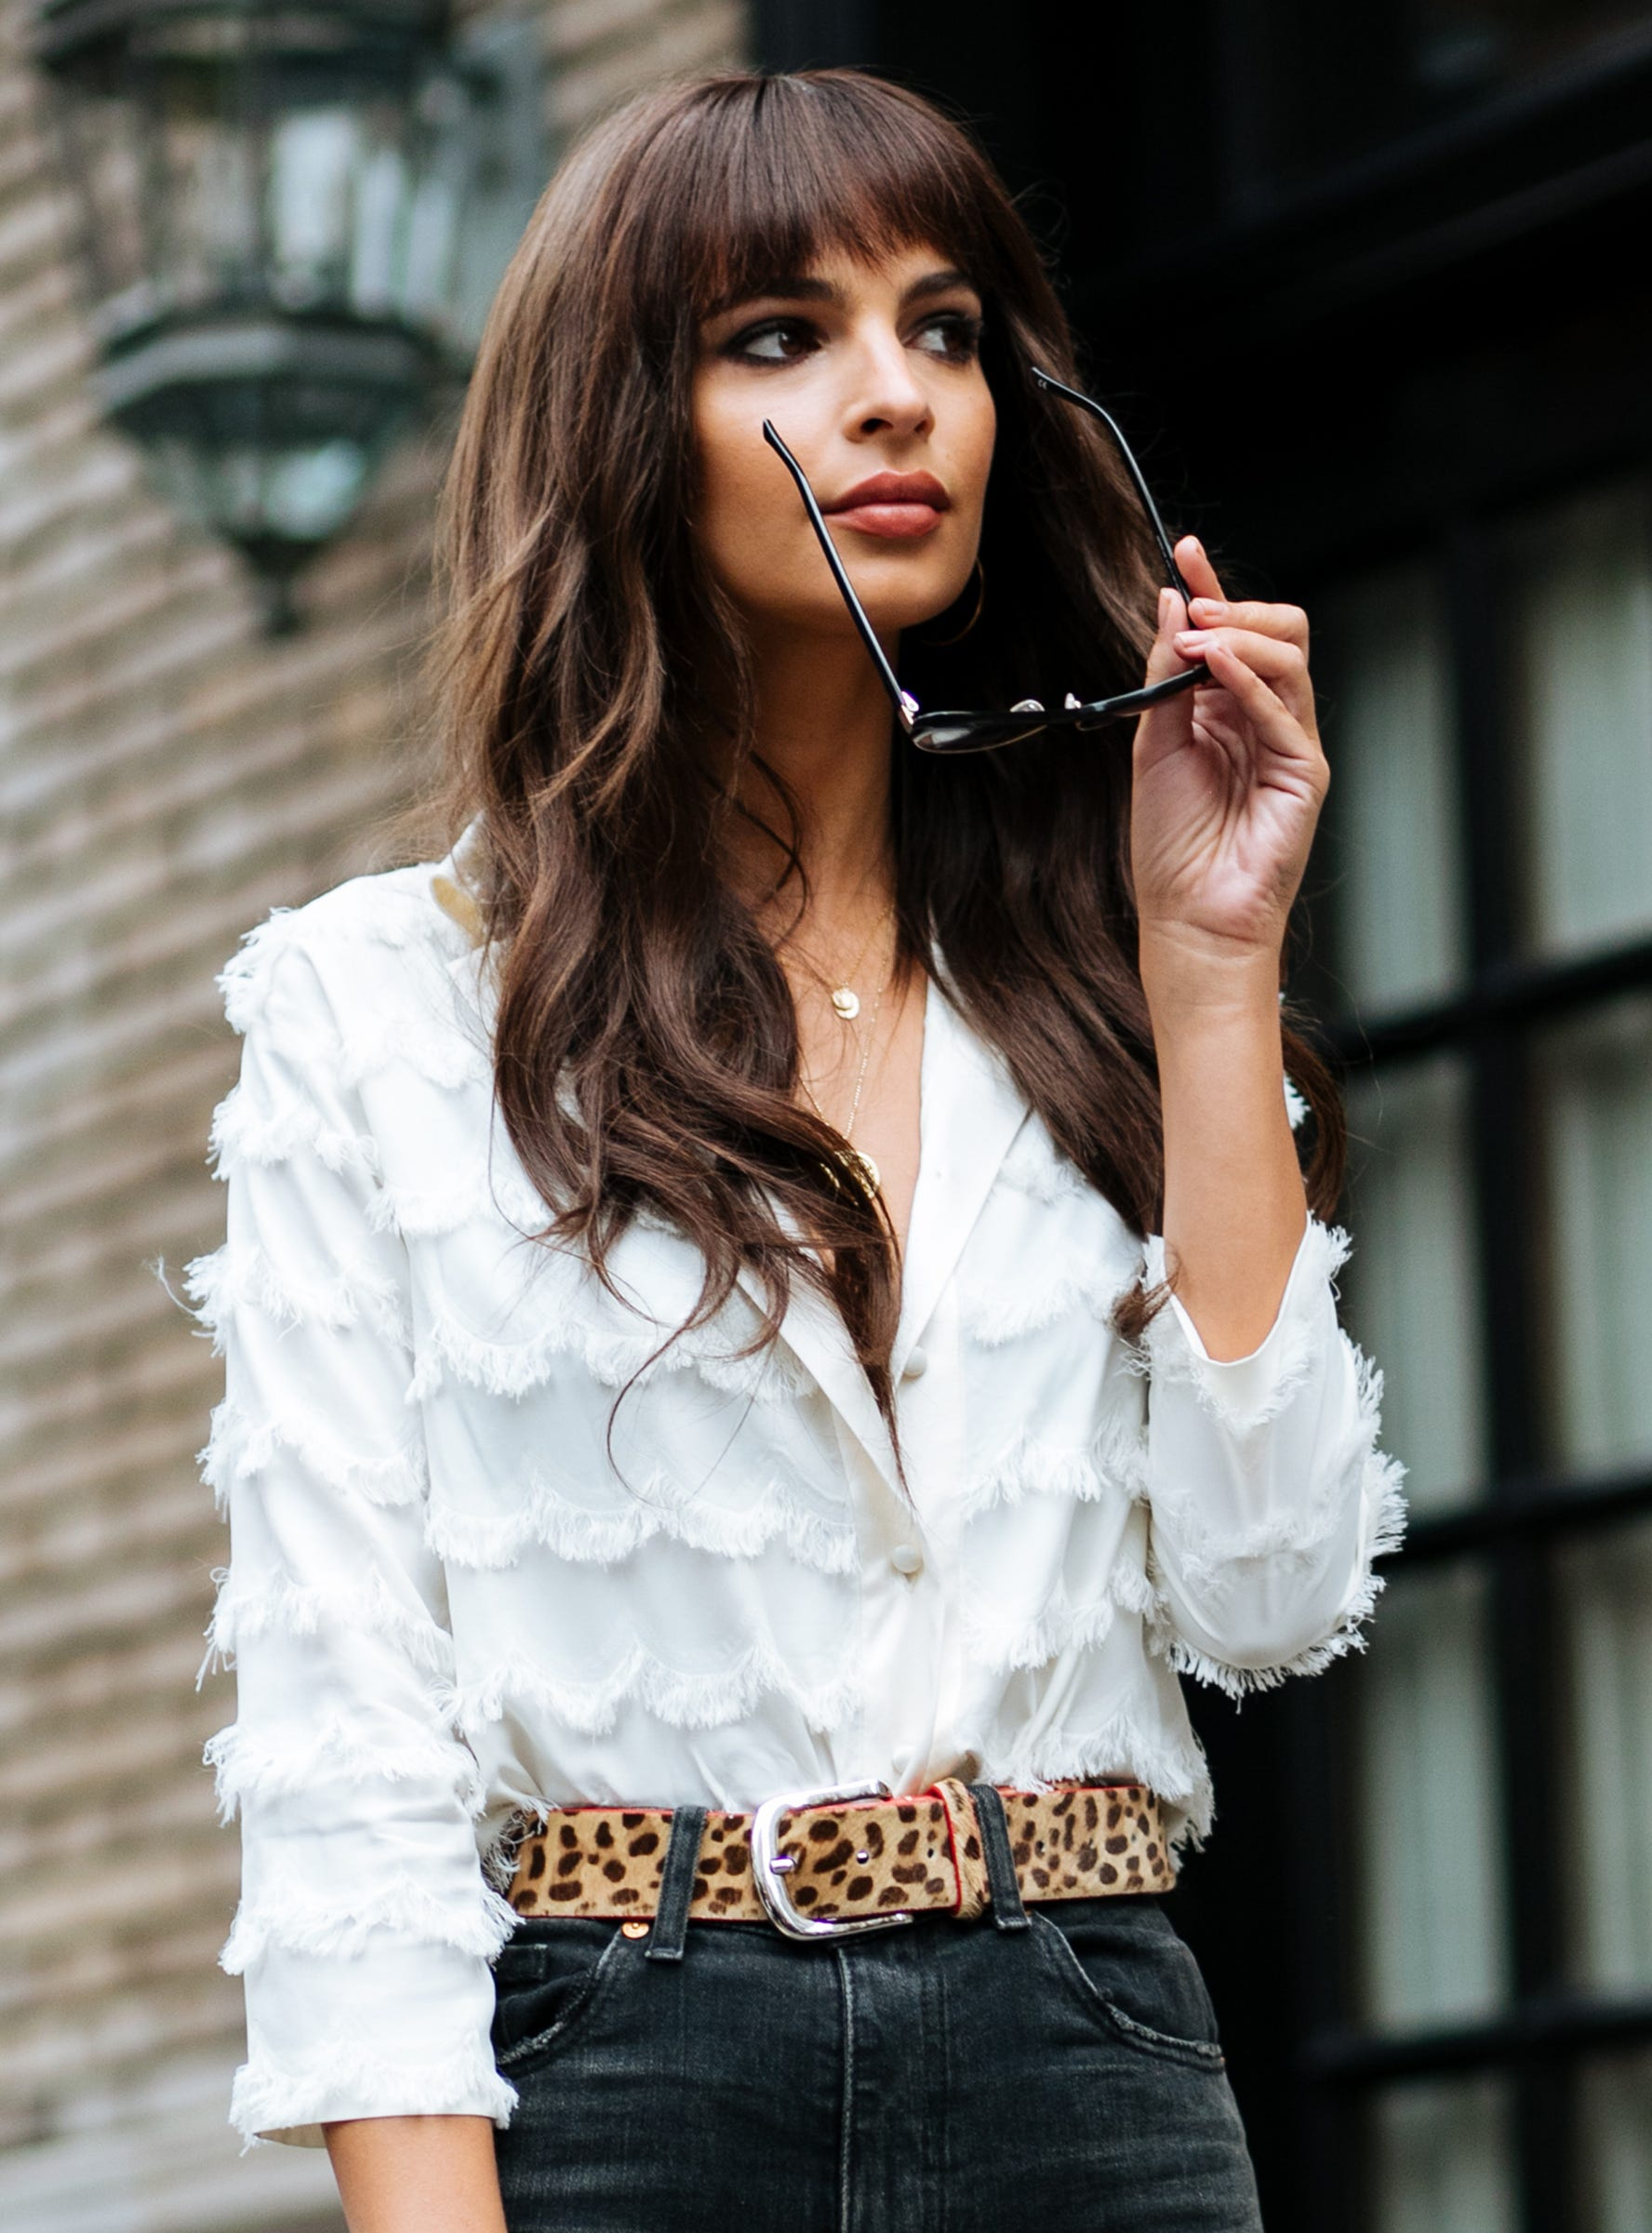 Lucy Hale Hair Fake Bangs Jenna Dewan Trend Photos